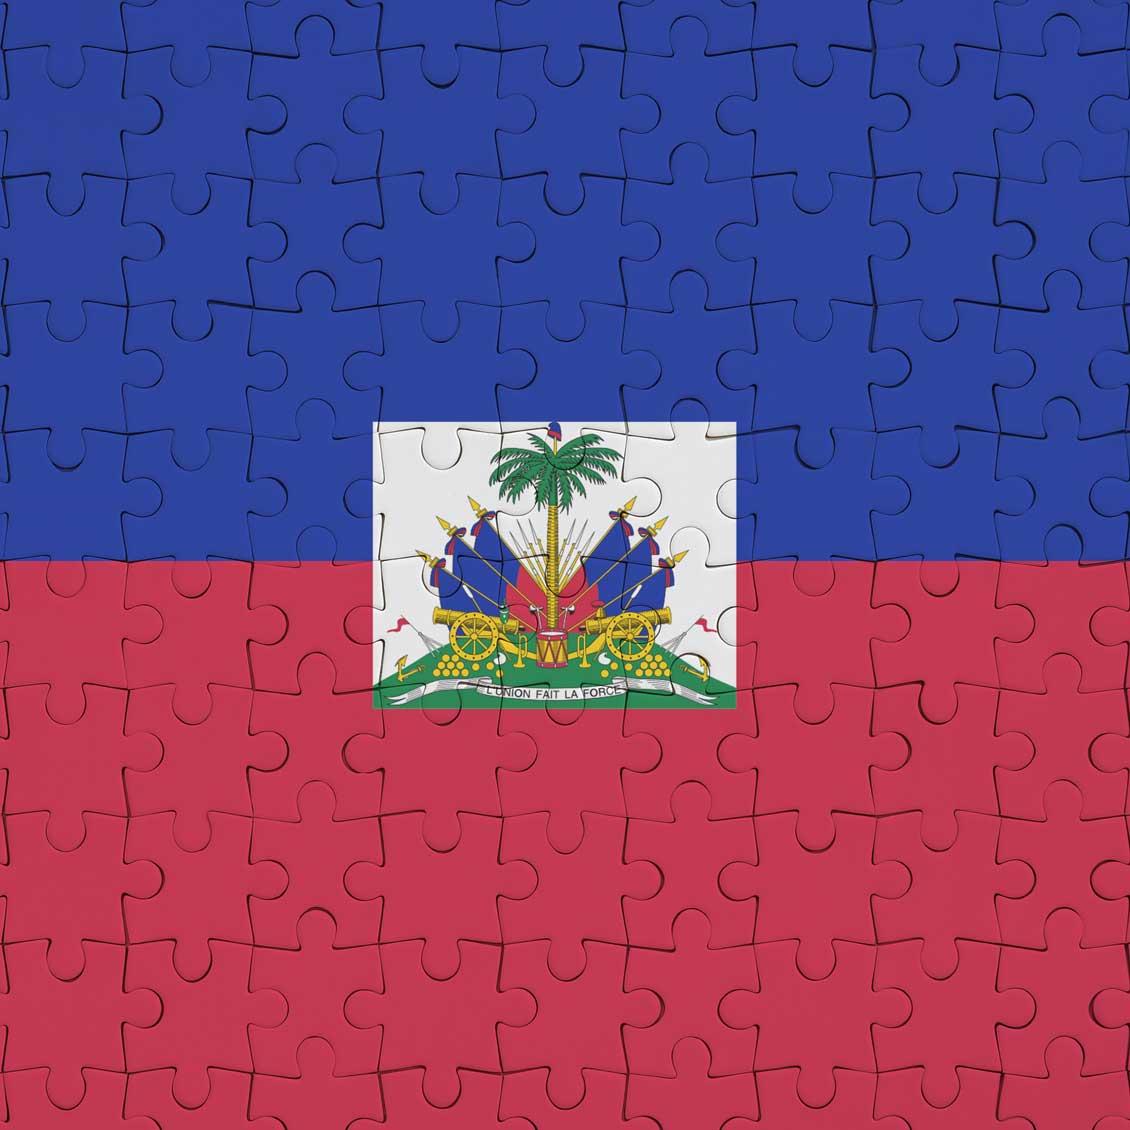 English To Haitian Creole - Haitian Creole Translation Services